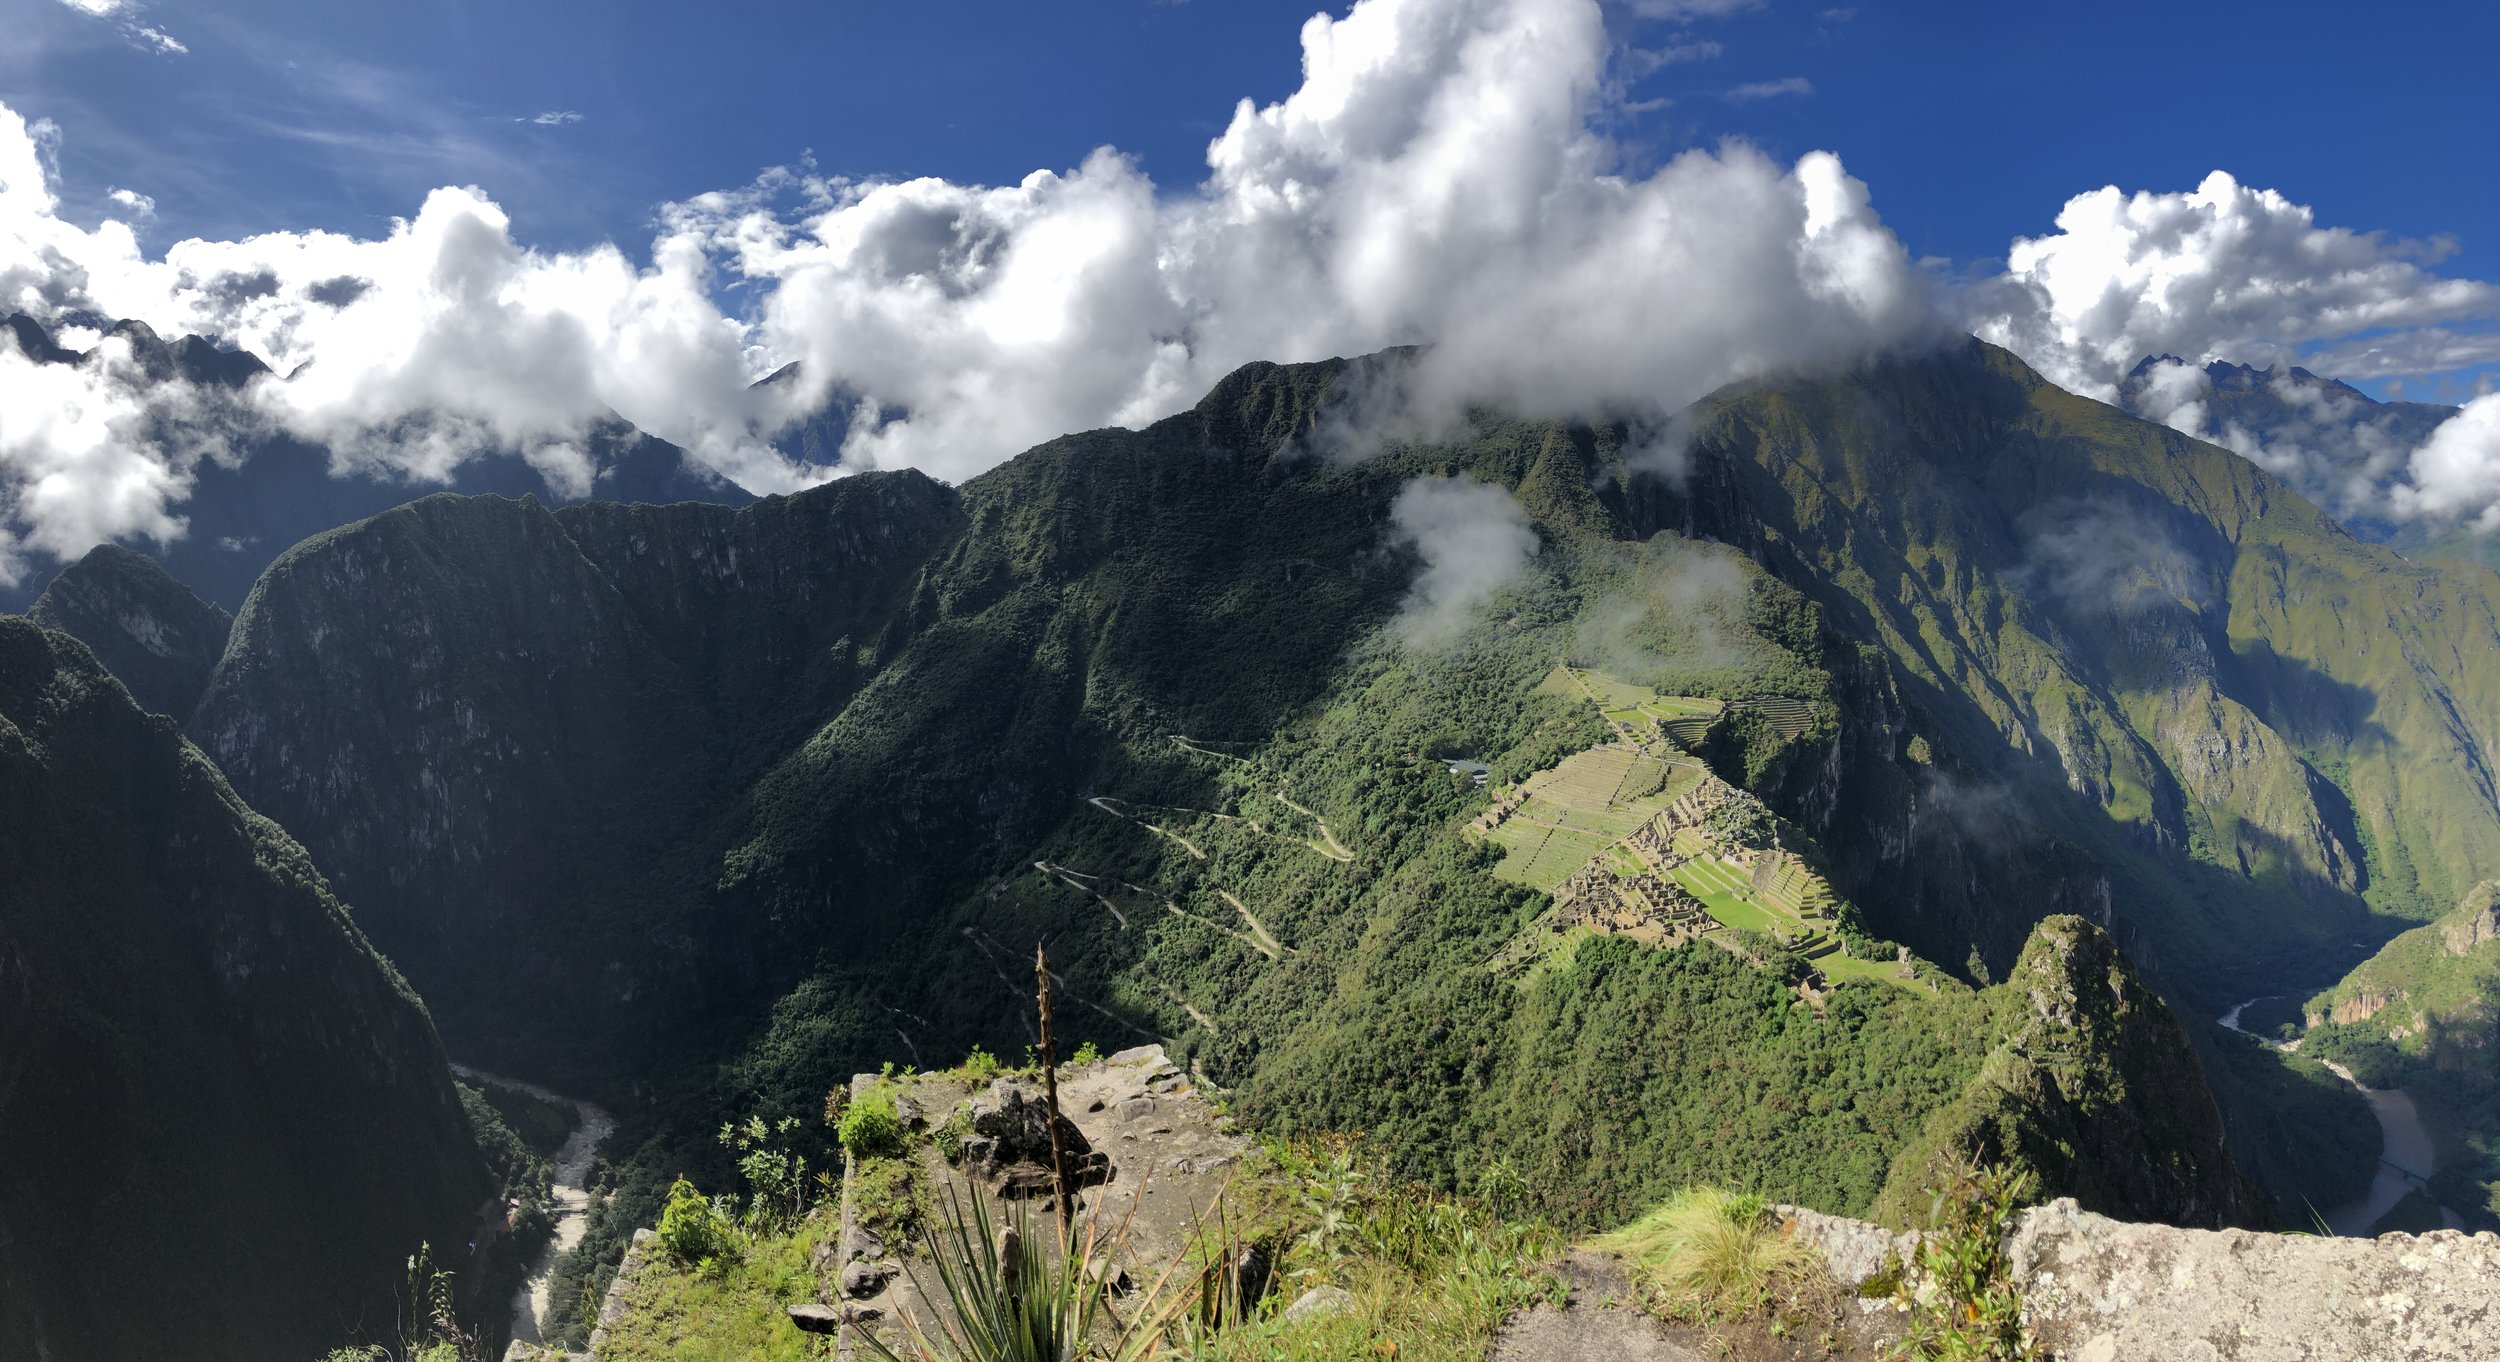 machu picchu - aguas calientes - south america - travel tips-landscape